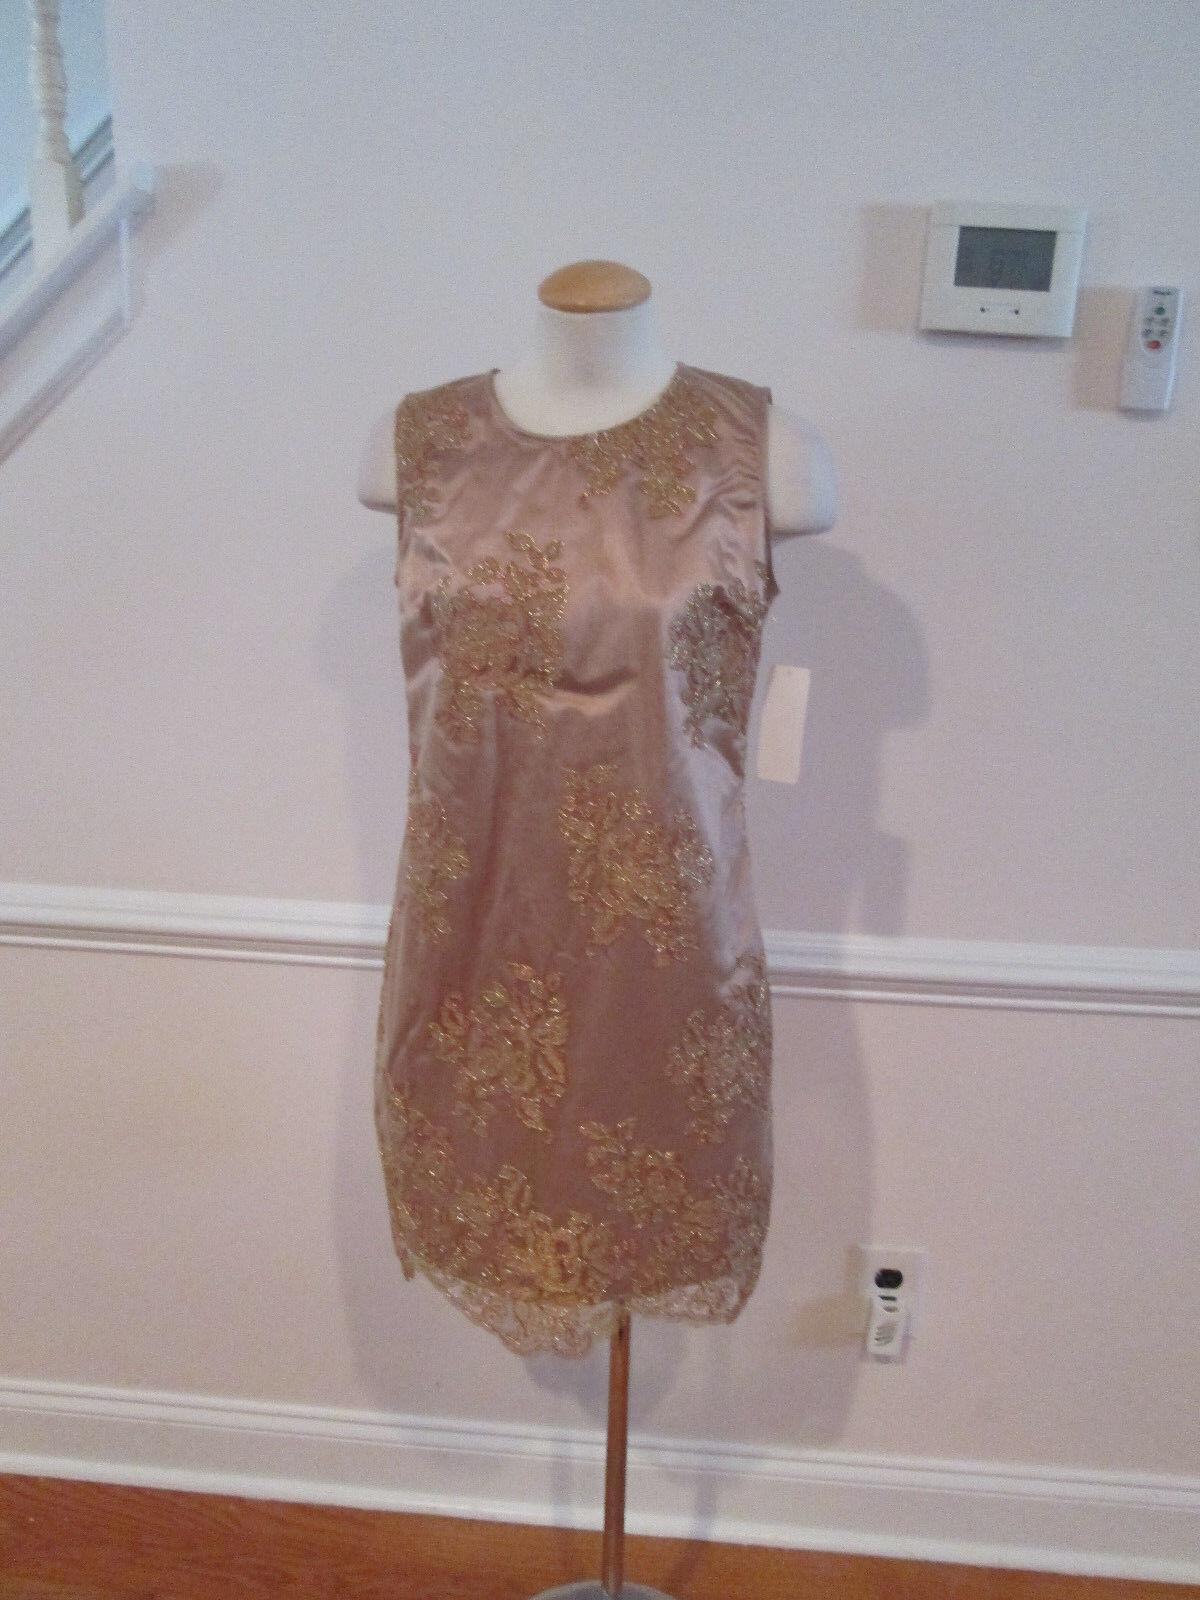 Boston proper lace dress was   Rosa Gold 2